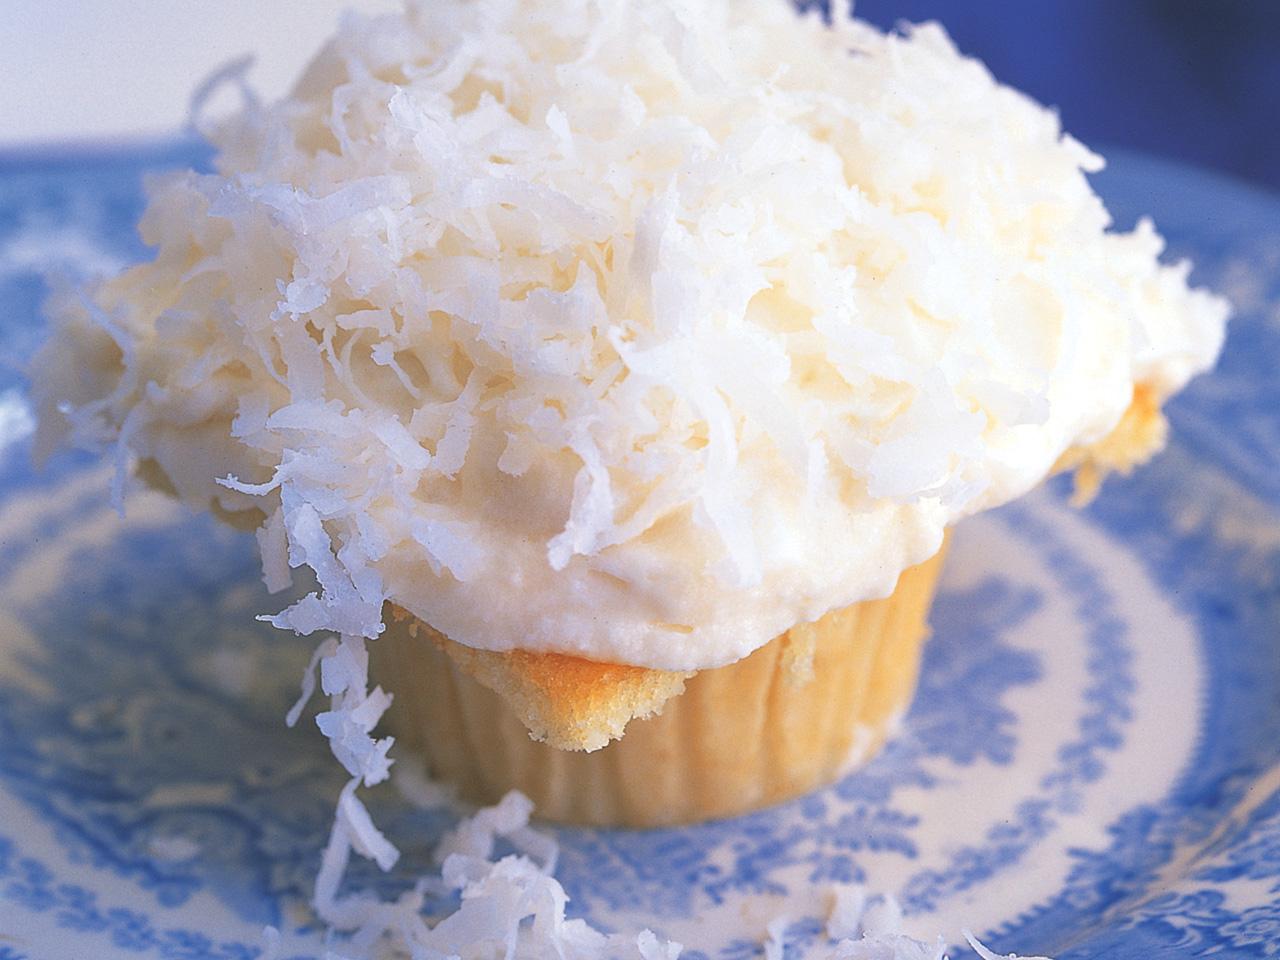 Ina Garten Cream Cheese Frosting recipe: ina garten's coconut cupcakes - cbs news